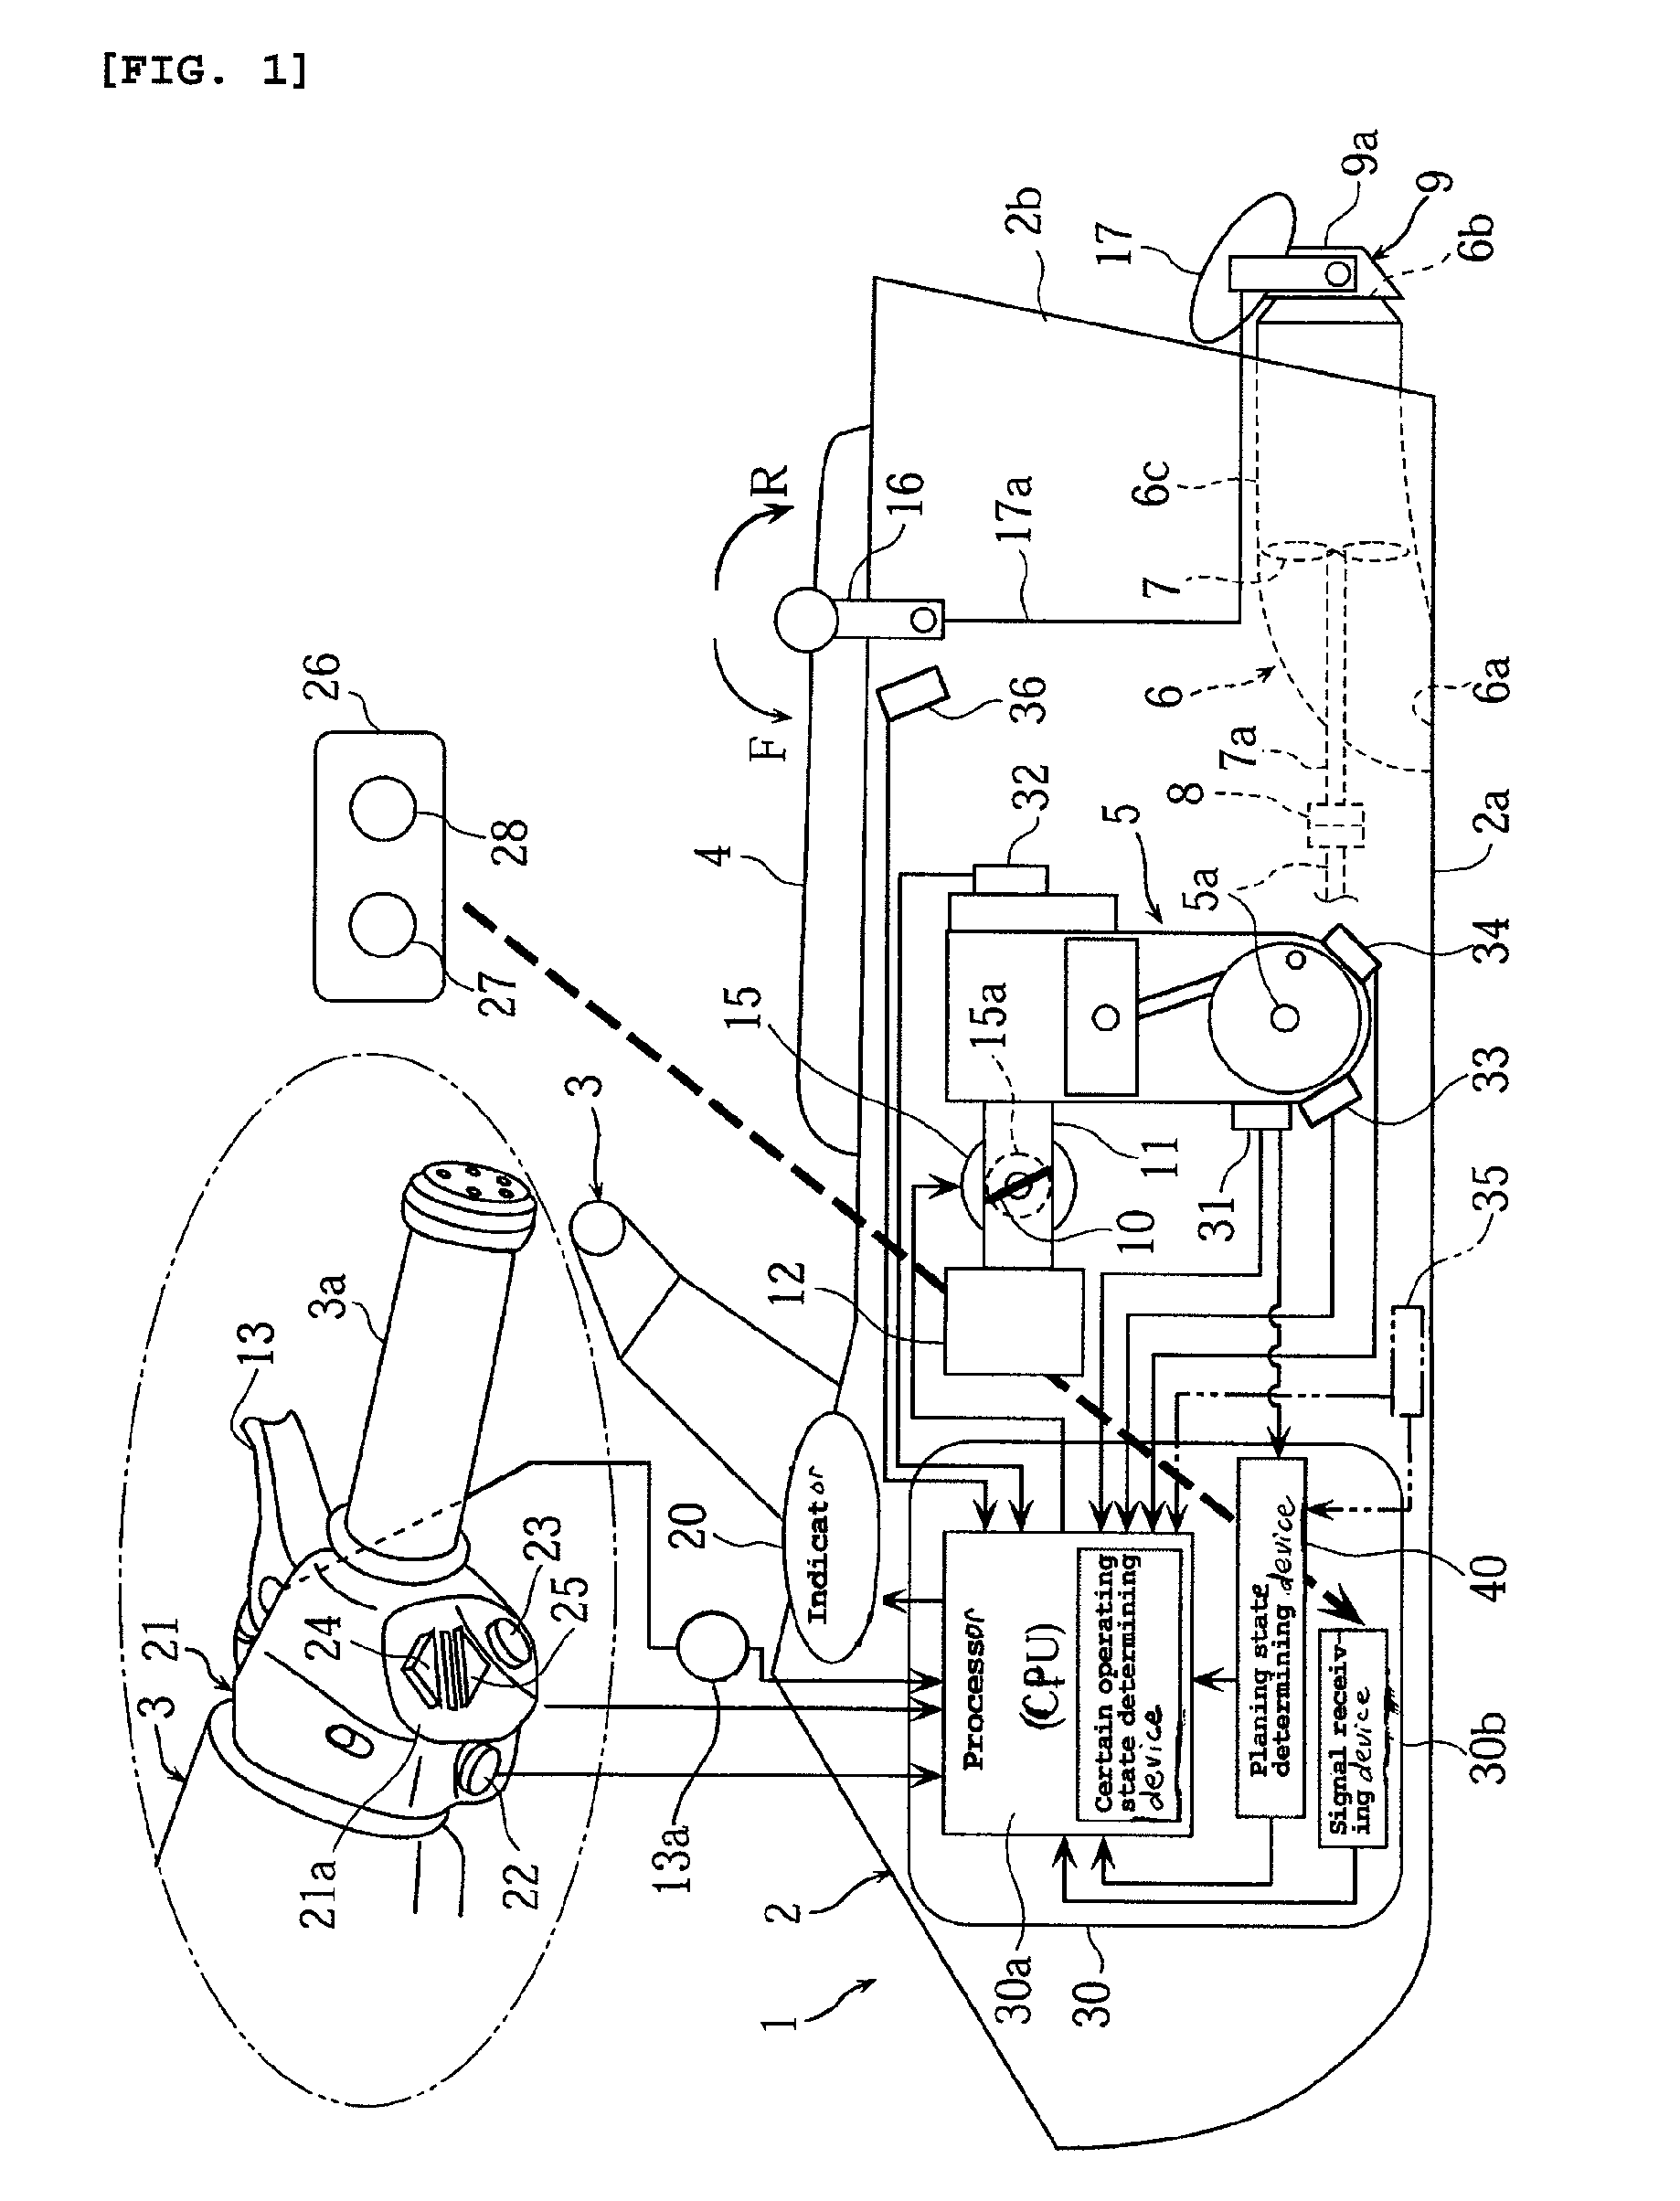 Shallow Well Sprinkler Pump | Wiring Diagram Database on submersible pump wiring diagram, honeywell pump wiring diagram, peerless pump wiring diagram, bosch pump wiring diagram, wayne pump wiring diagram,